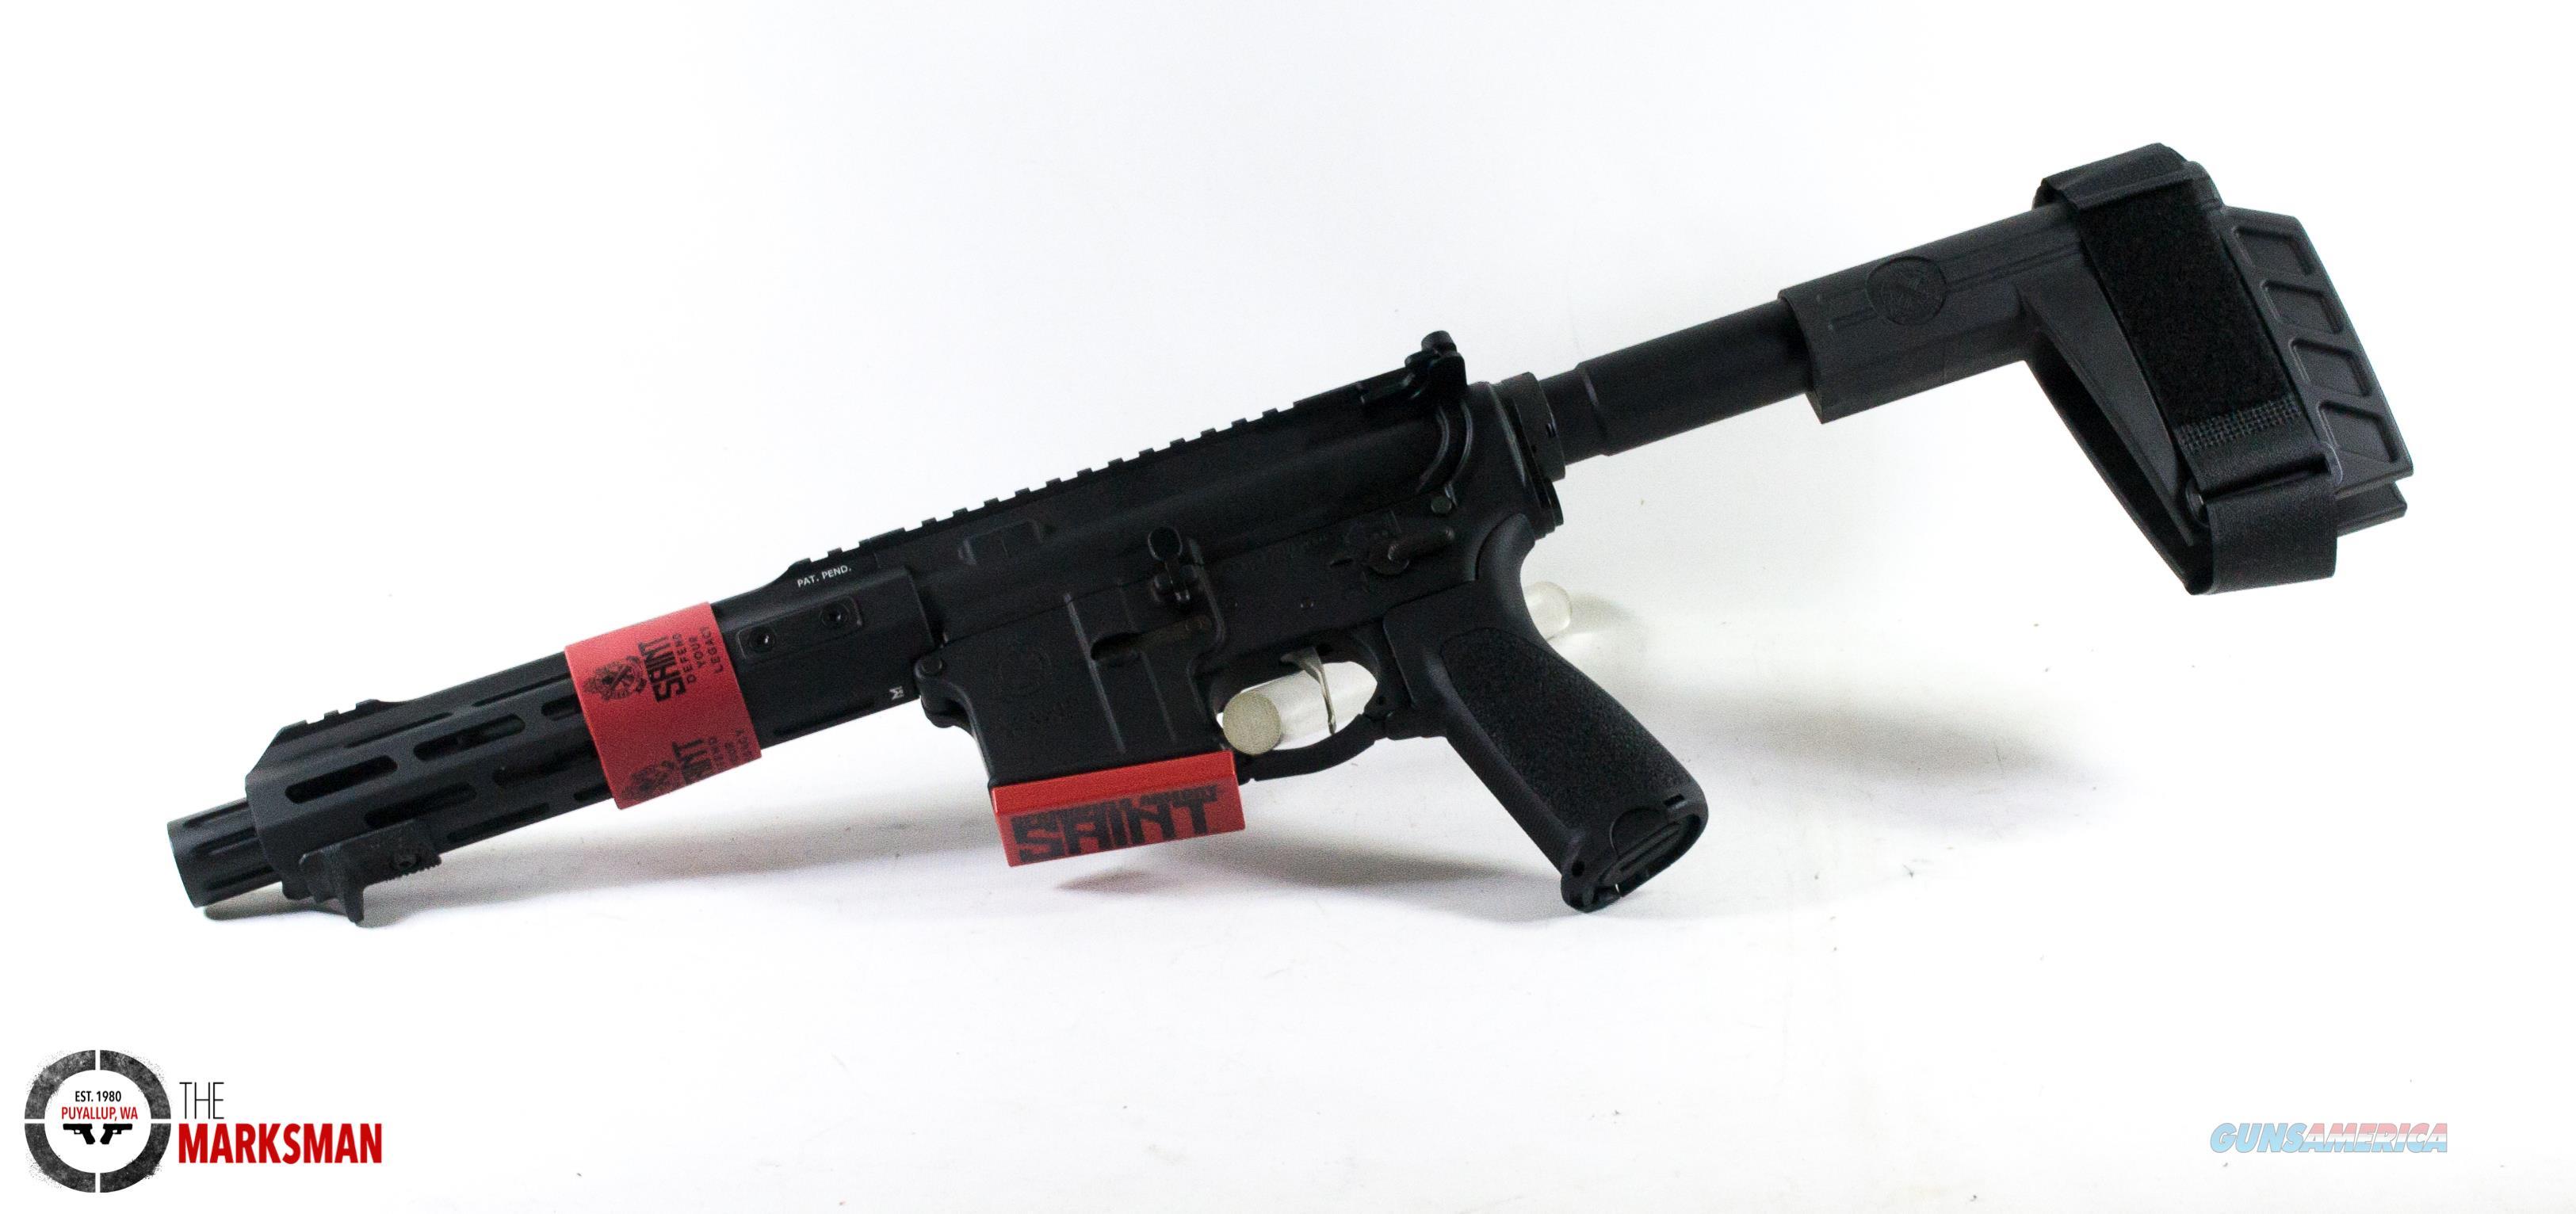 Springfield Armory Saint Victor AR-15 Pistol, 5.56mm NATO NEW  Guns > Pistols > Springfield Armory Pistols > SAINT Pistol